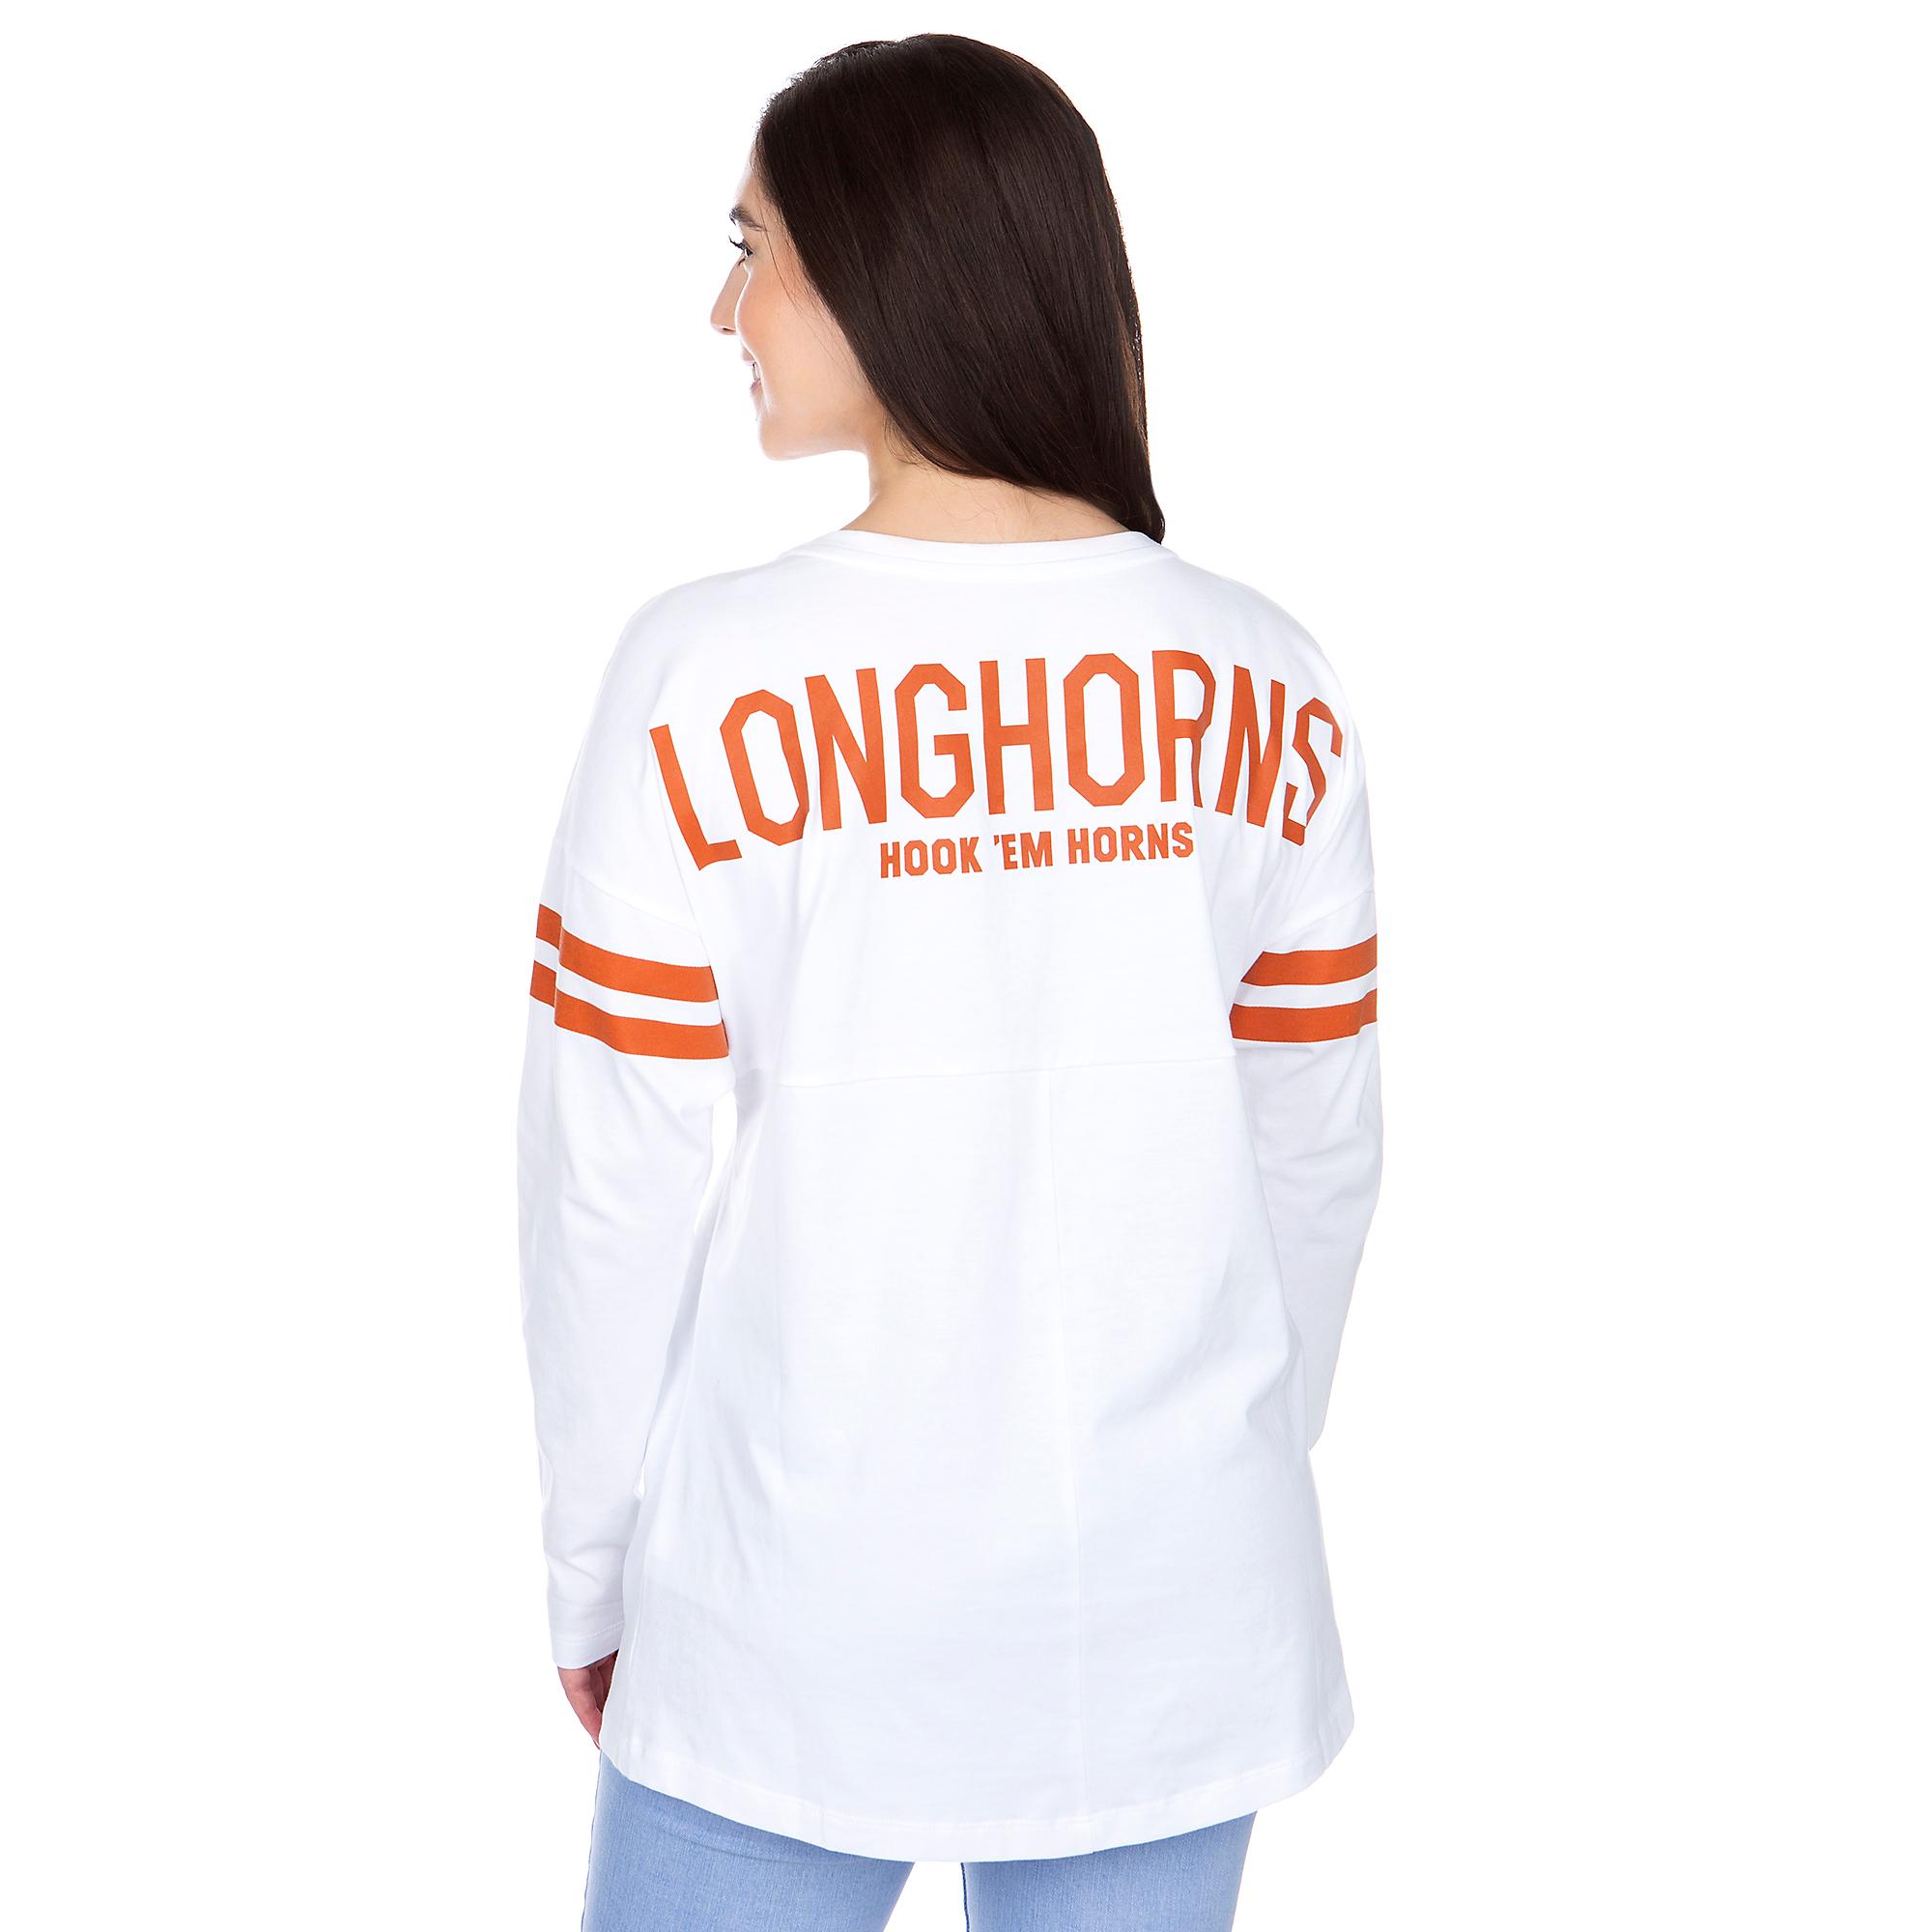 Texas Longhorns Womens Nike Tailgate Long Sleeve T-Shirt